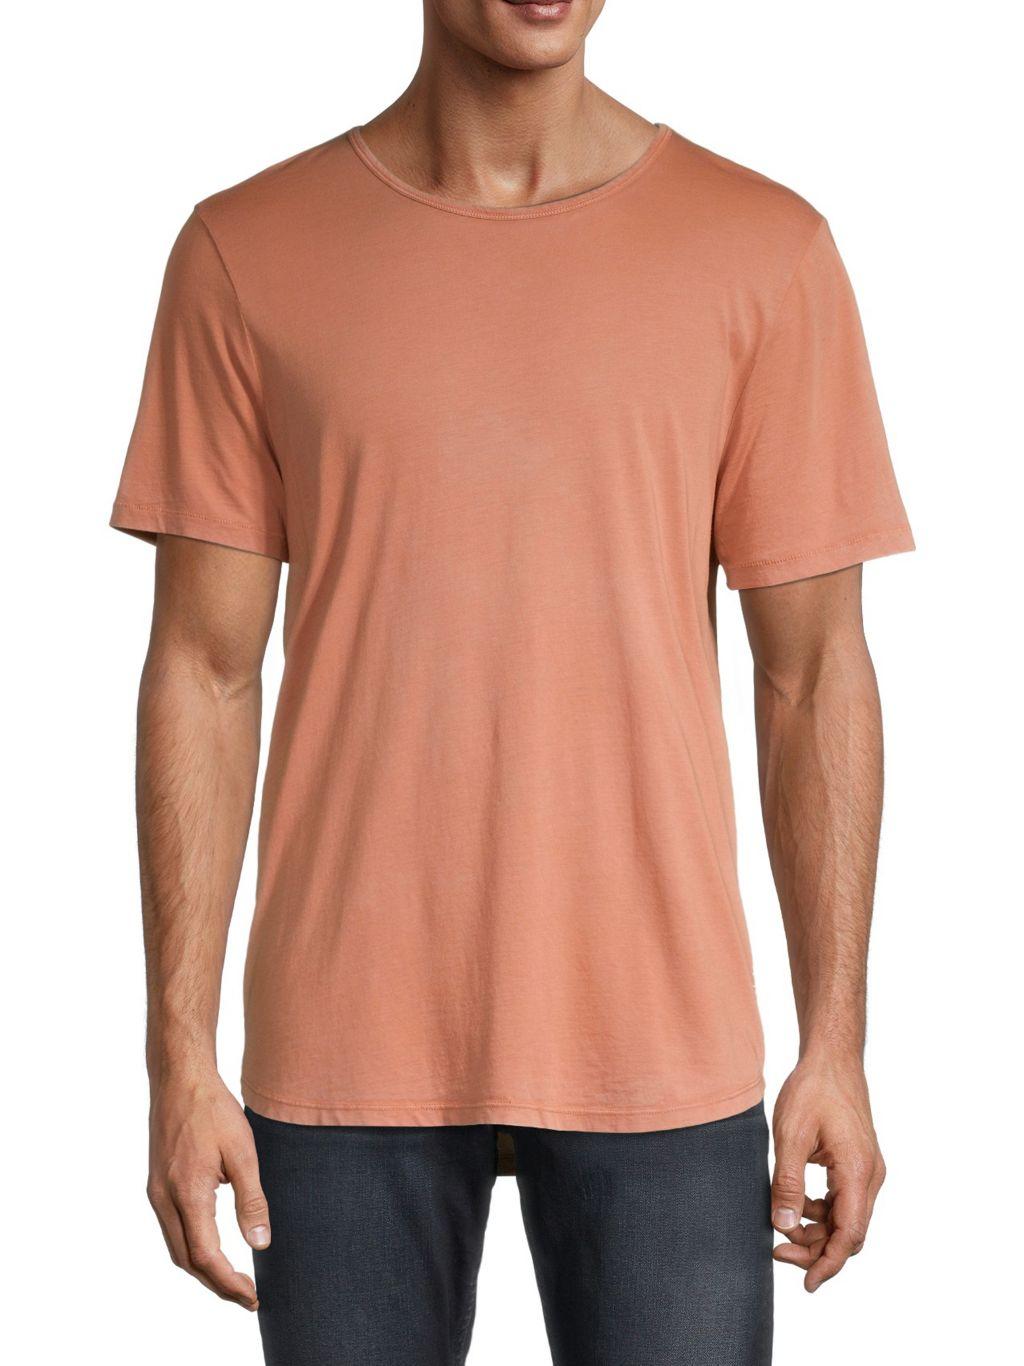 7 For All Mankind Roamer Crew T-Shirt